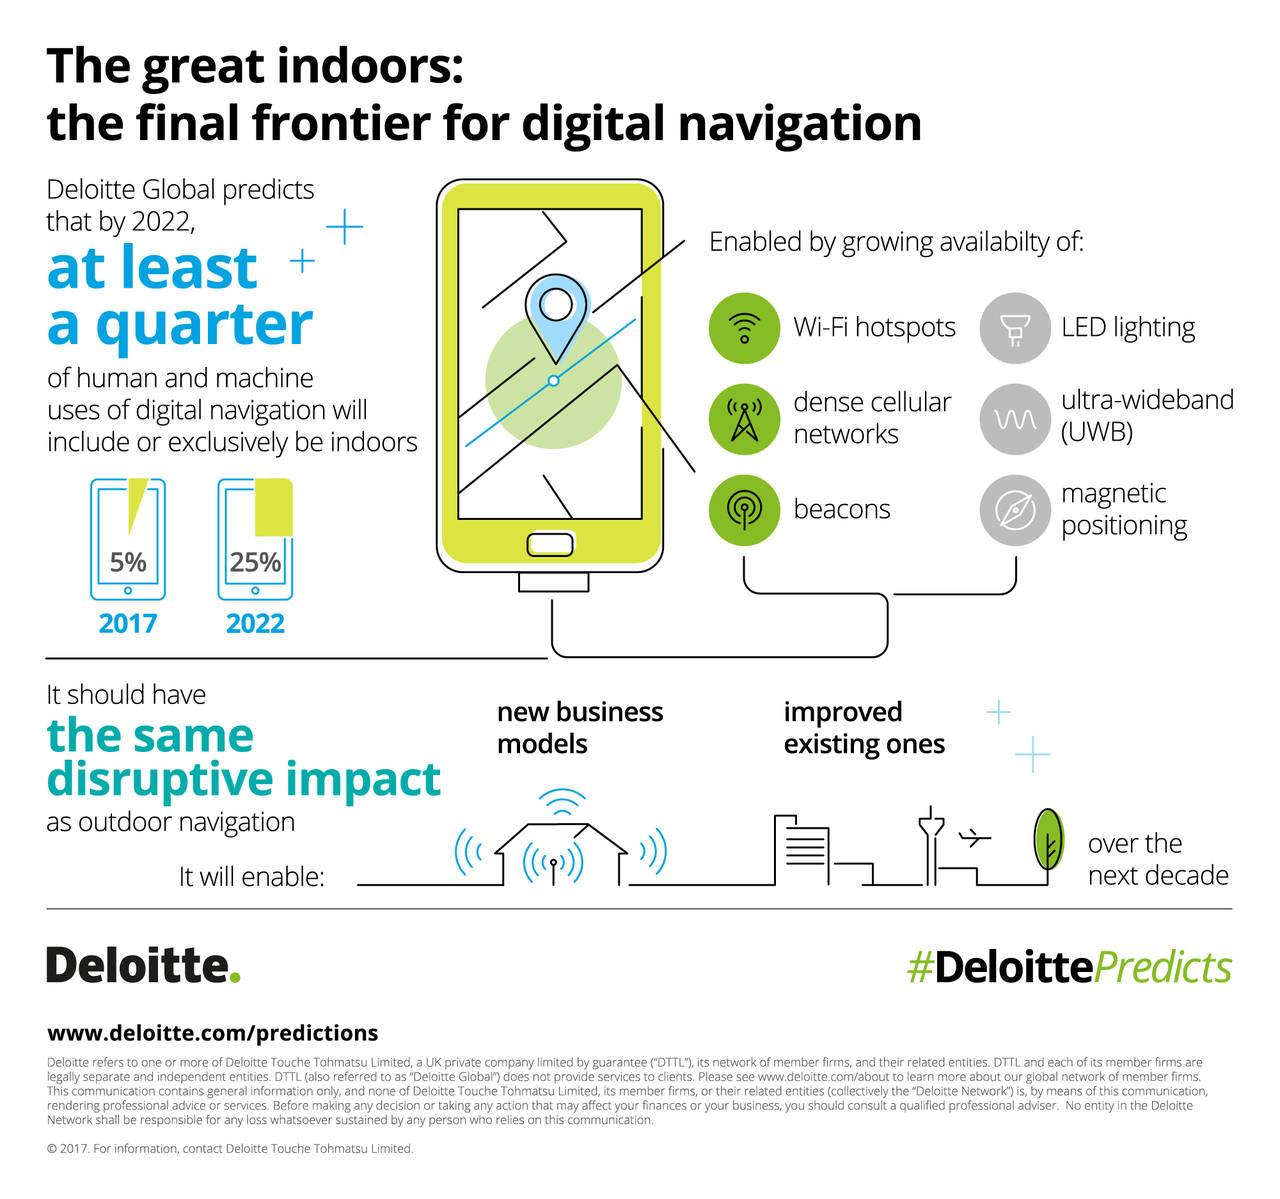 gx-deloitte-tmt-2017-indoor-navigation